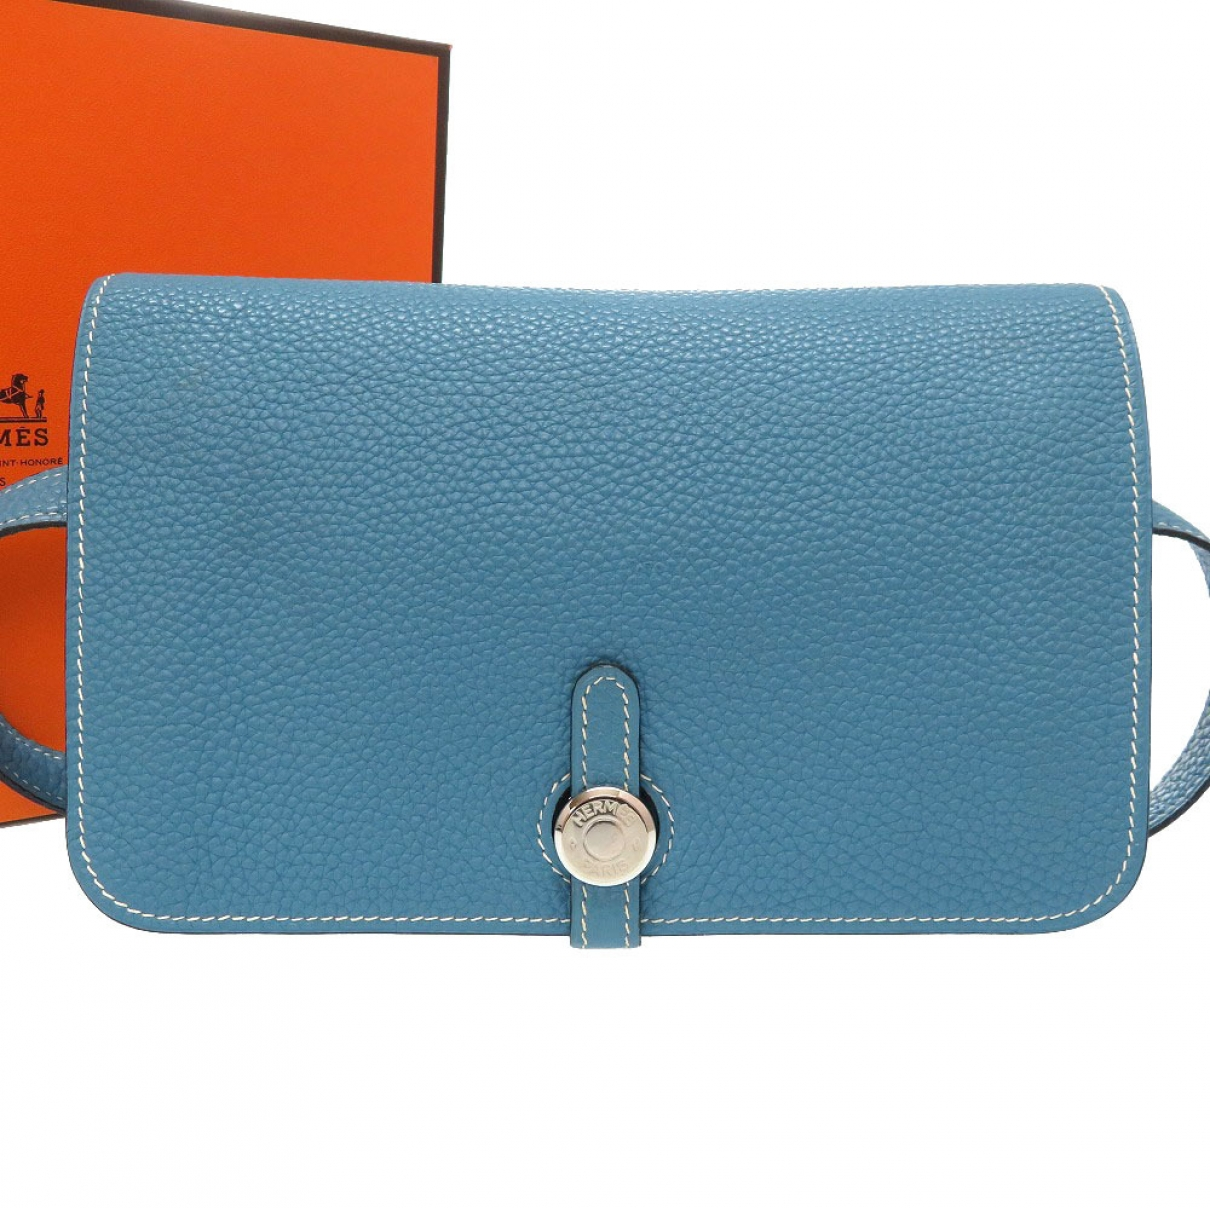 Hermès Dogon Blue Leather Clutch bag for Women \N